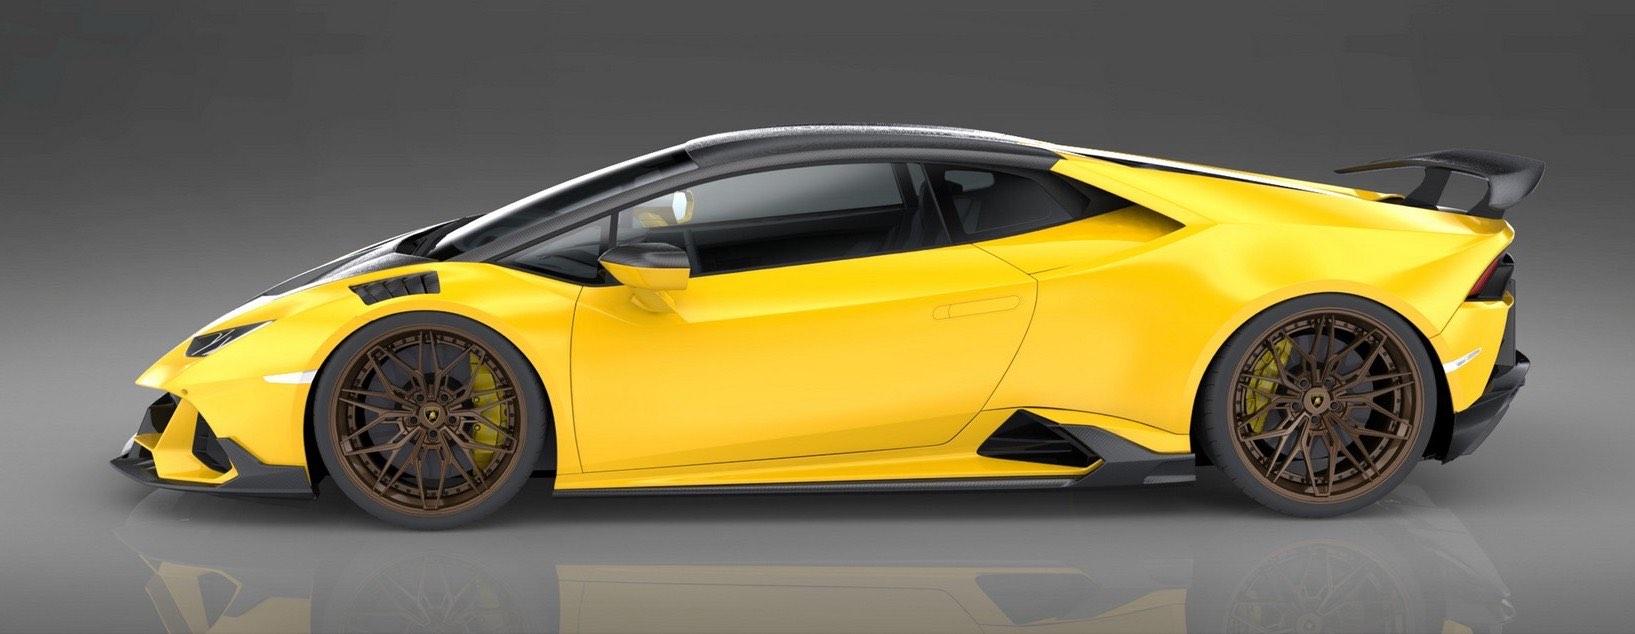 1016 Industries crean el primer Lamborghini Huracán Evo 100% de fibra de carbono del mundo